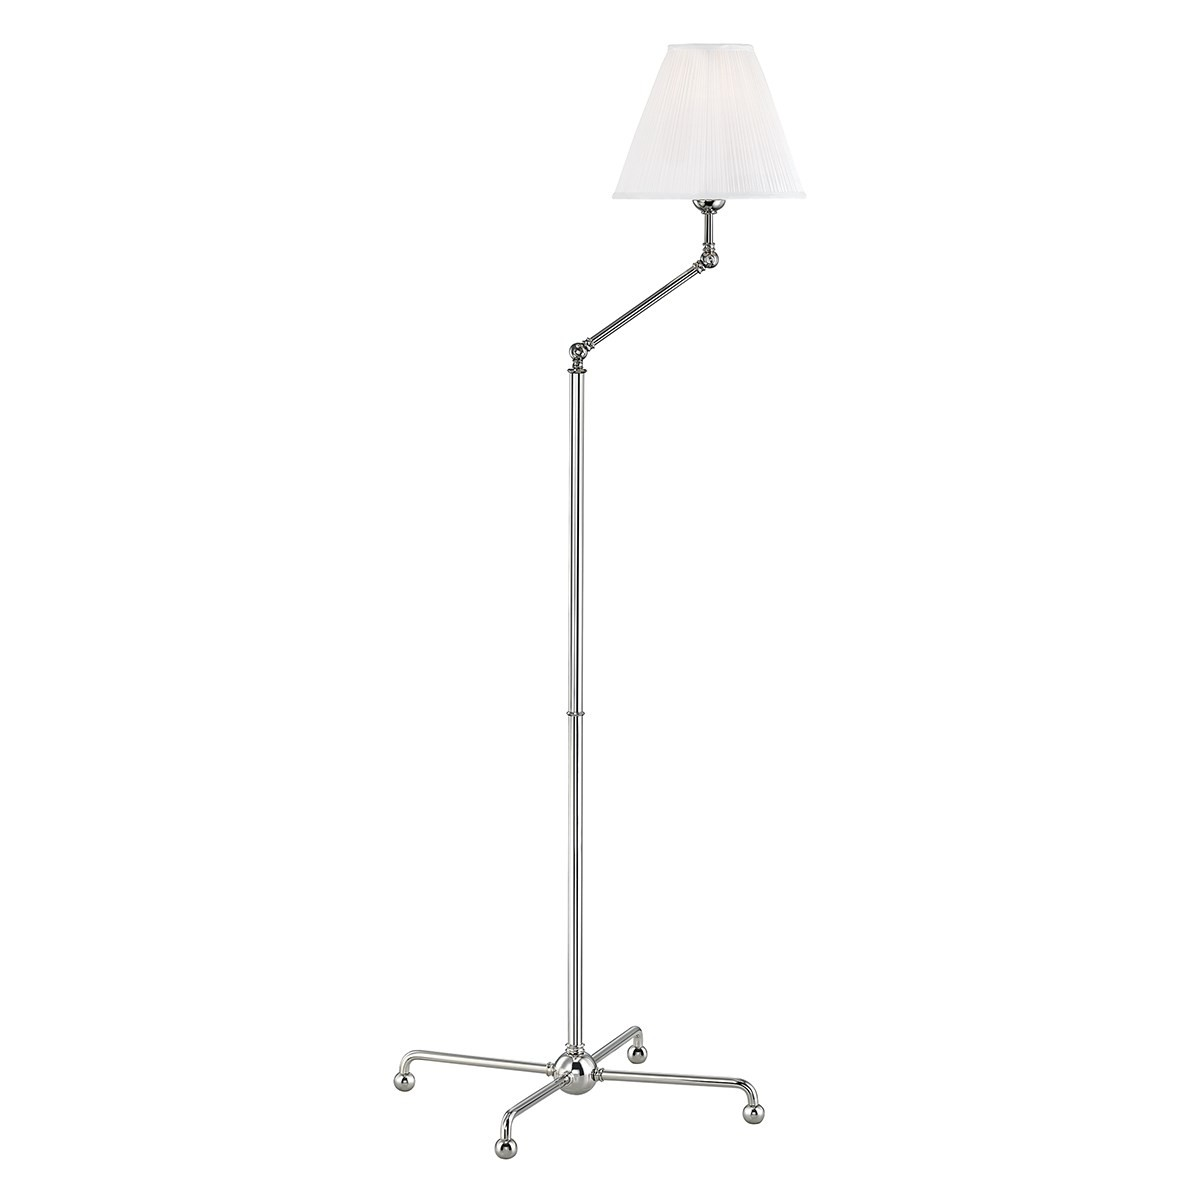 Hudson Valley I Classic No 1 Floor Lamp I Polished Nickel